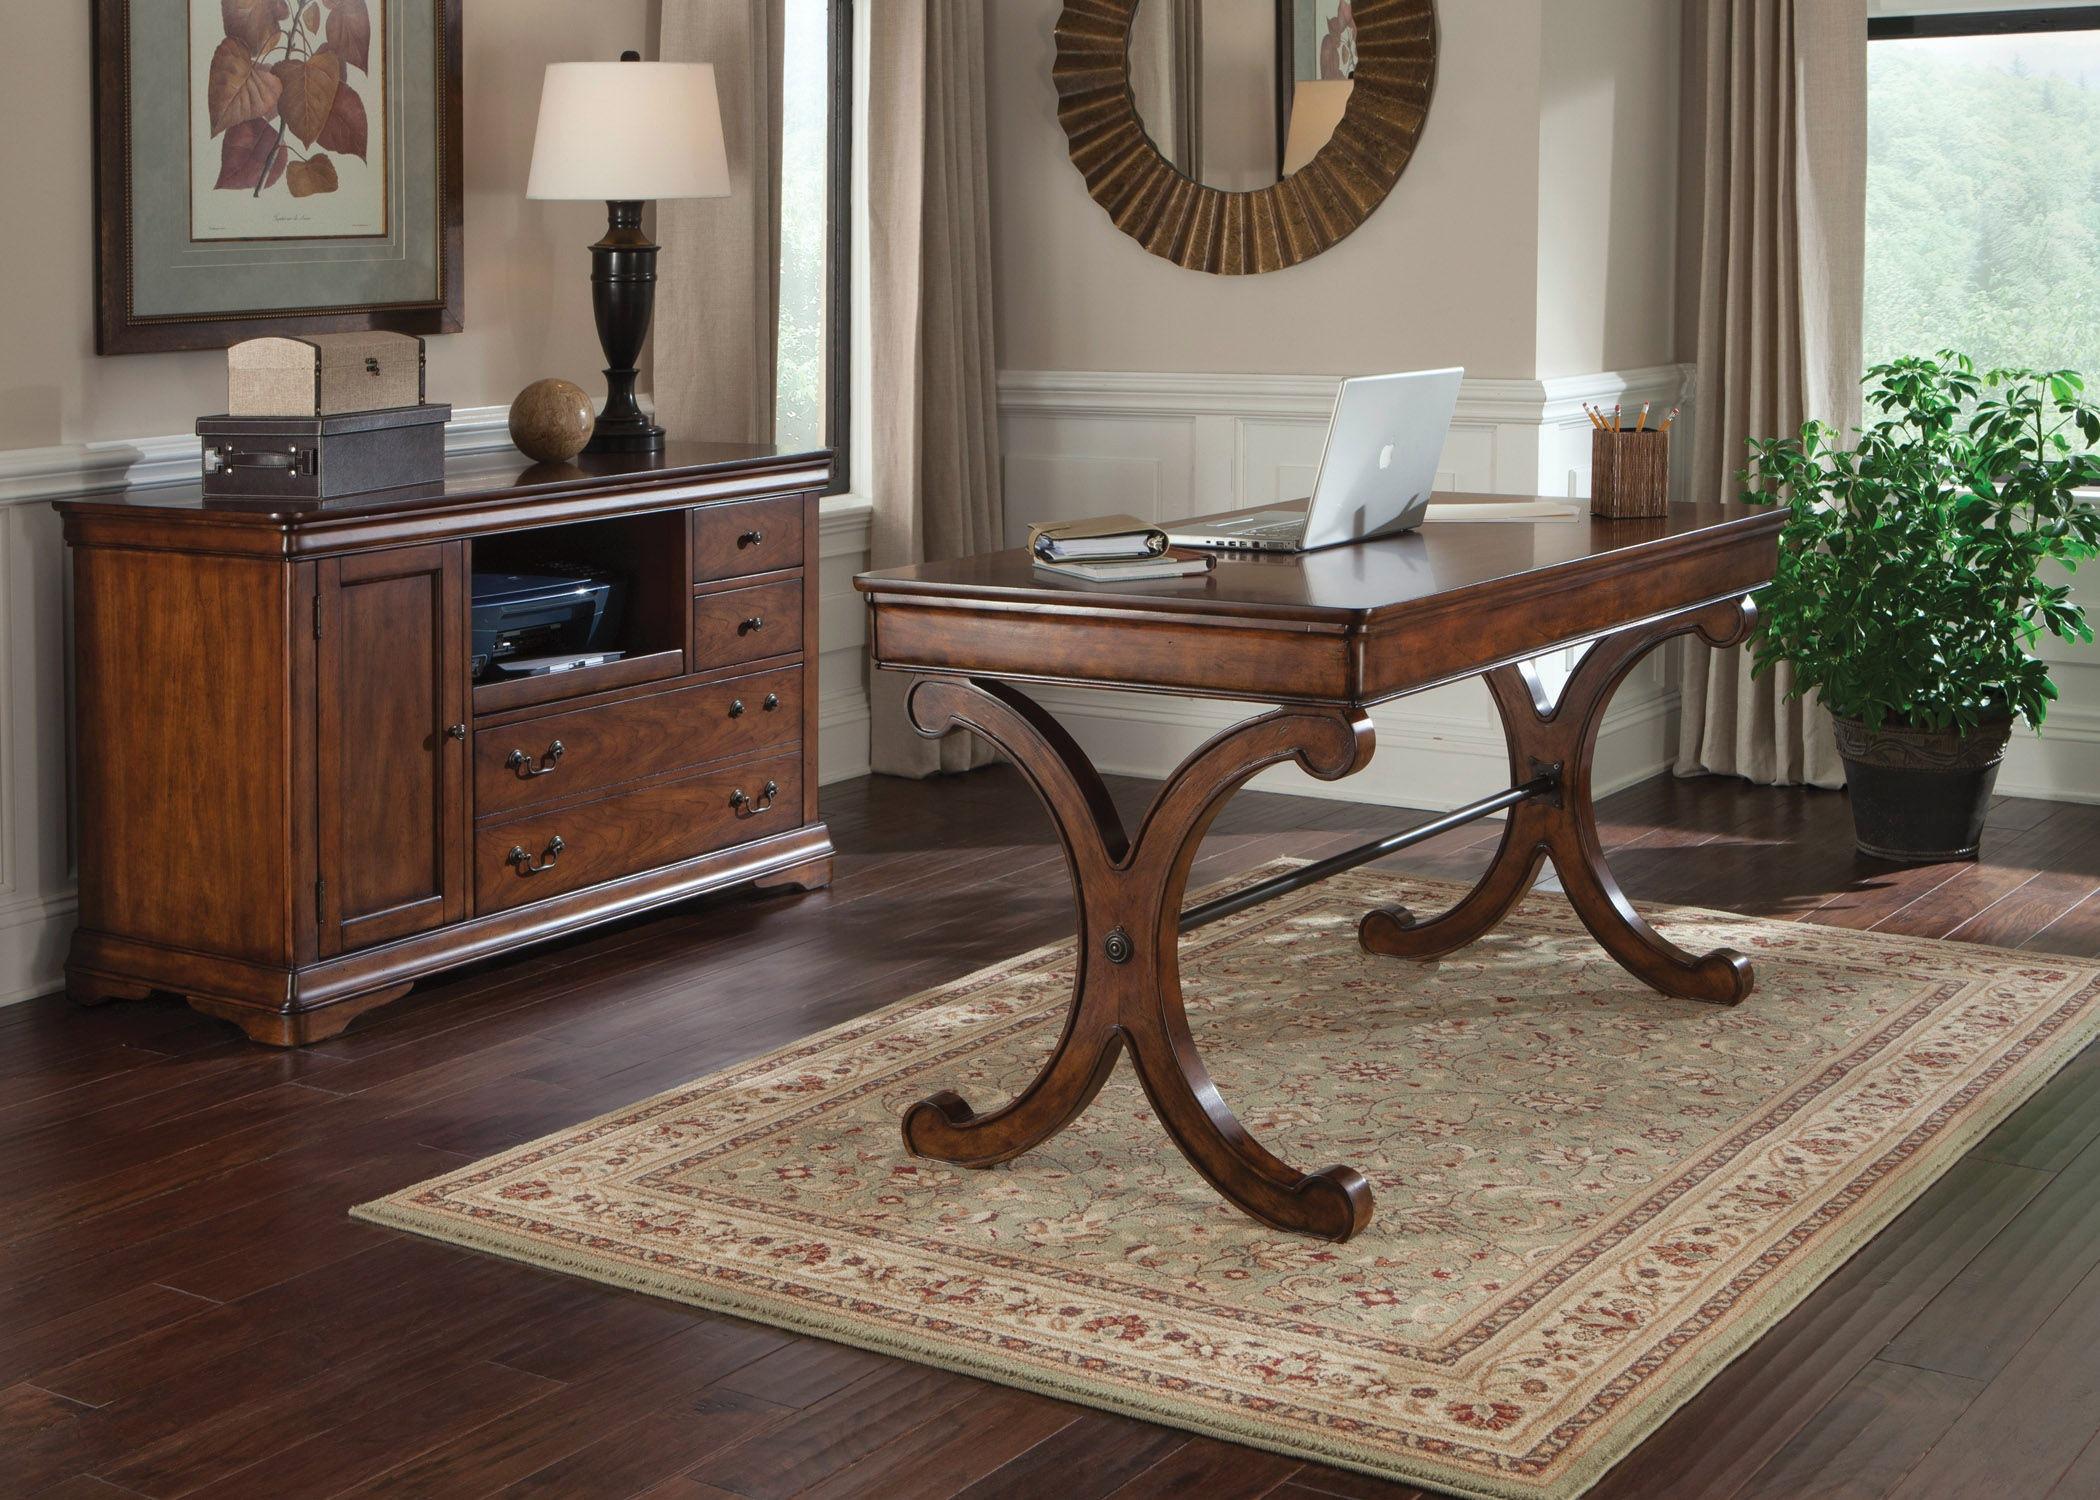 cds furniture. Liberty Furniture Complete Desk 378-HO-CDS Cds Furniture I